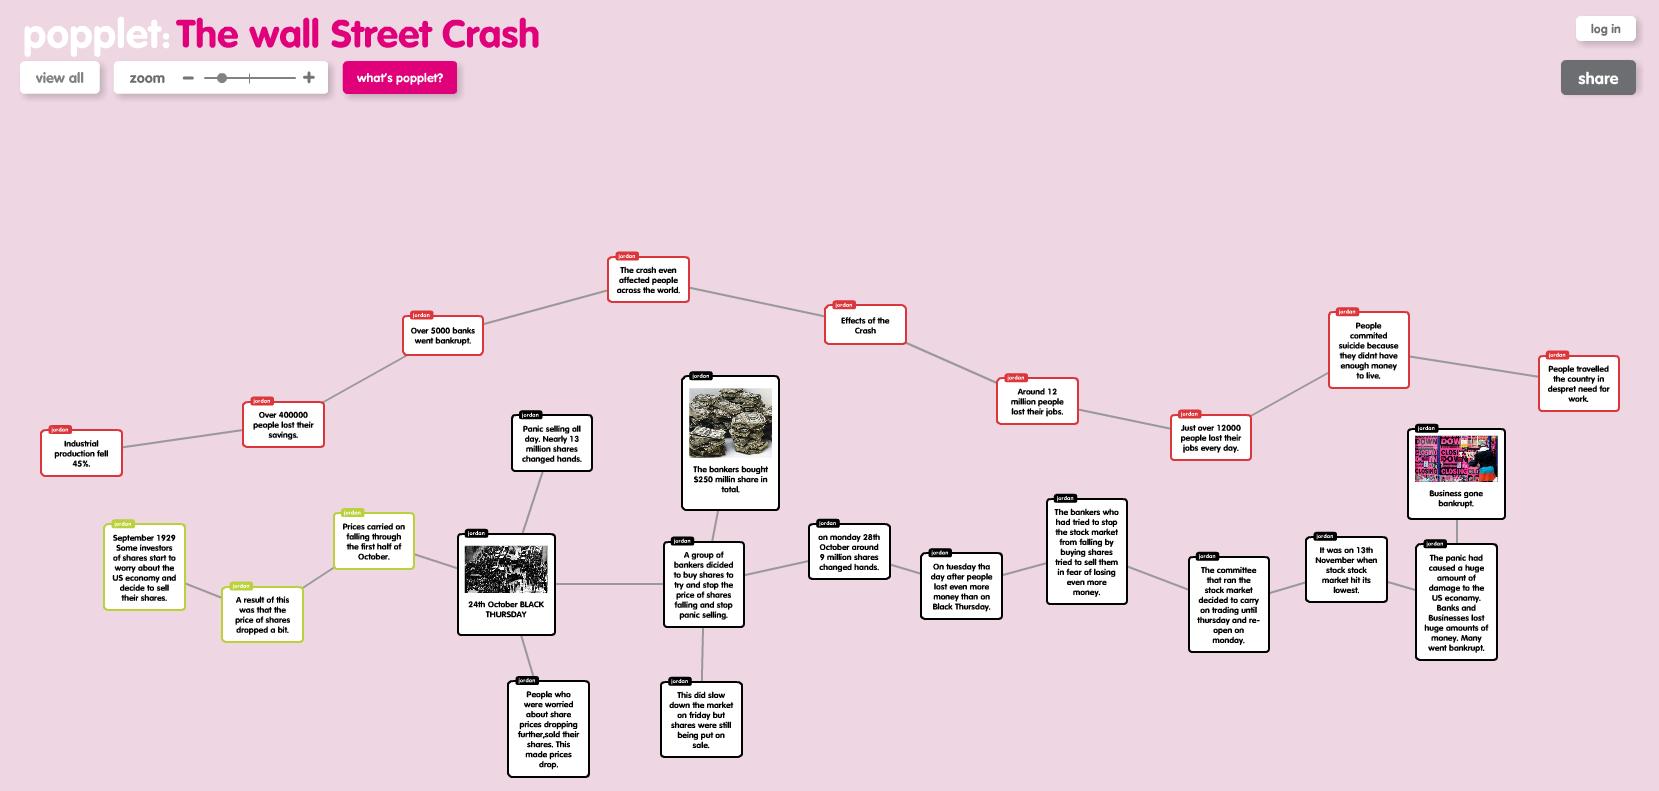 Wall Street Crash Timeline By Jordan From Mraotway S